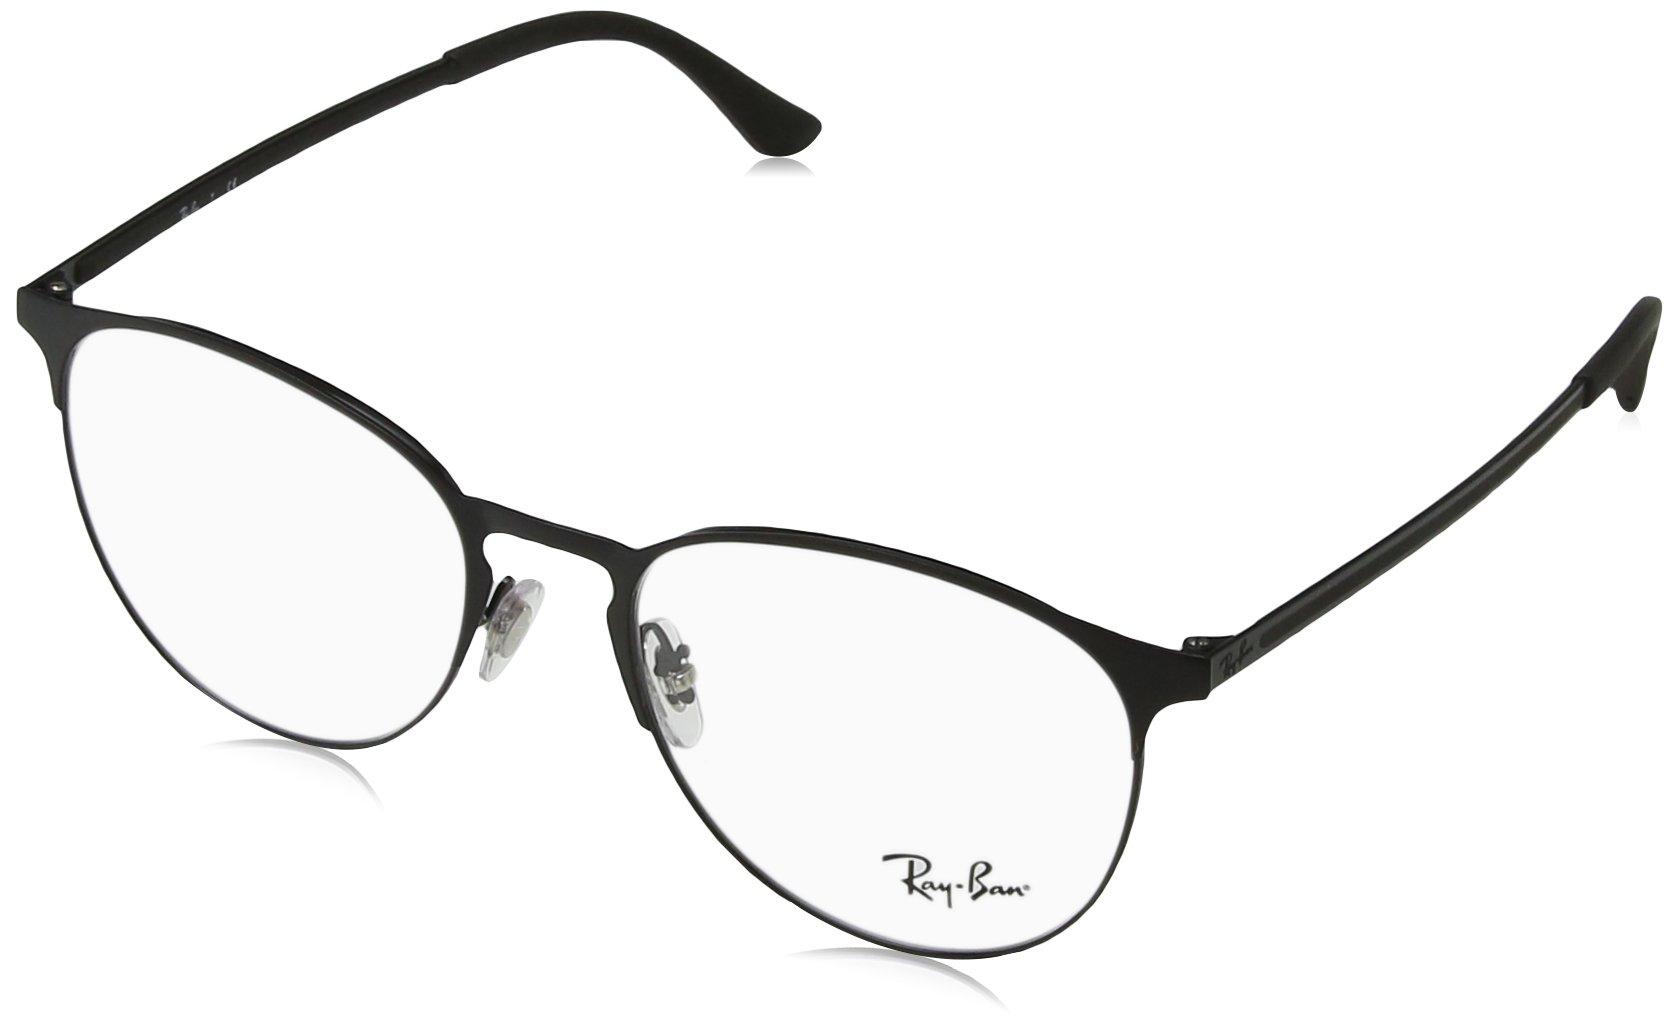 Ray-Ban Unisex RX6375 Eyeglasses Black Top On Matte Black 51mm